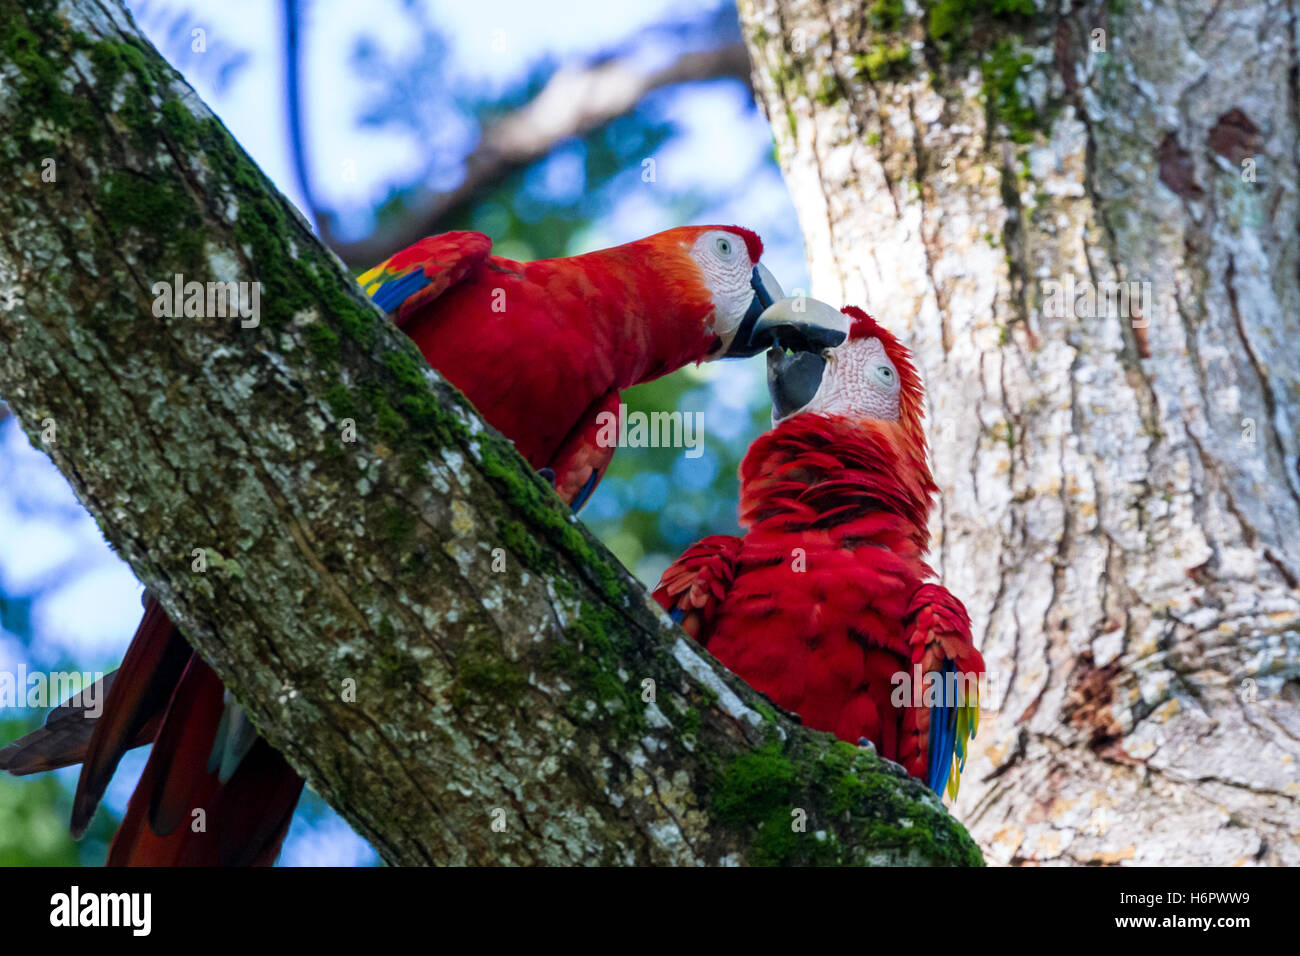 314eee425330 loving pair of scarlet macaws kissing underneath a tree Stock Photo ...